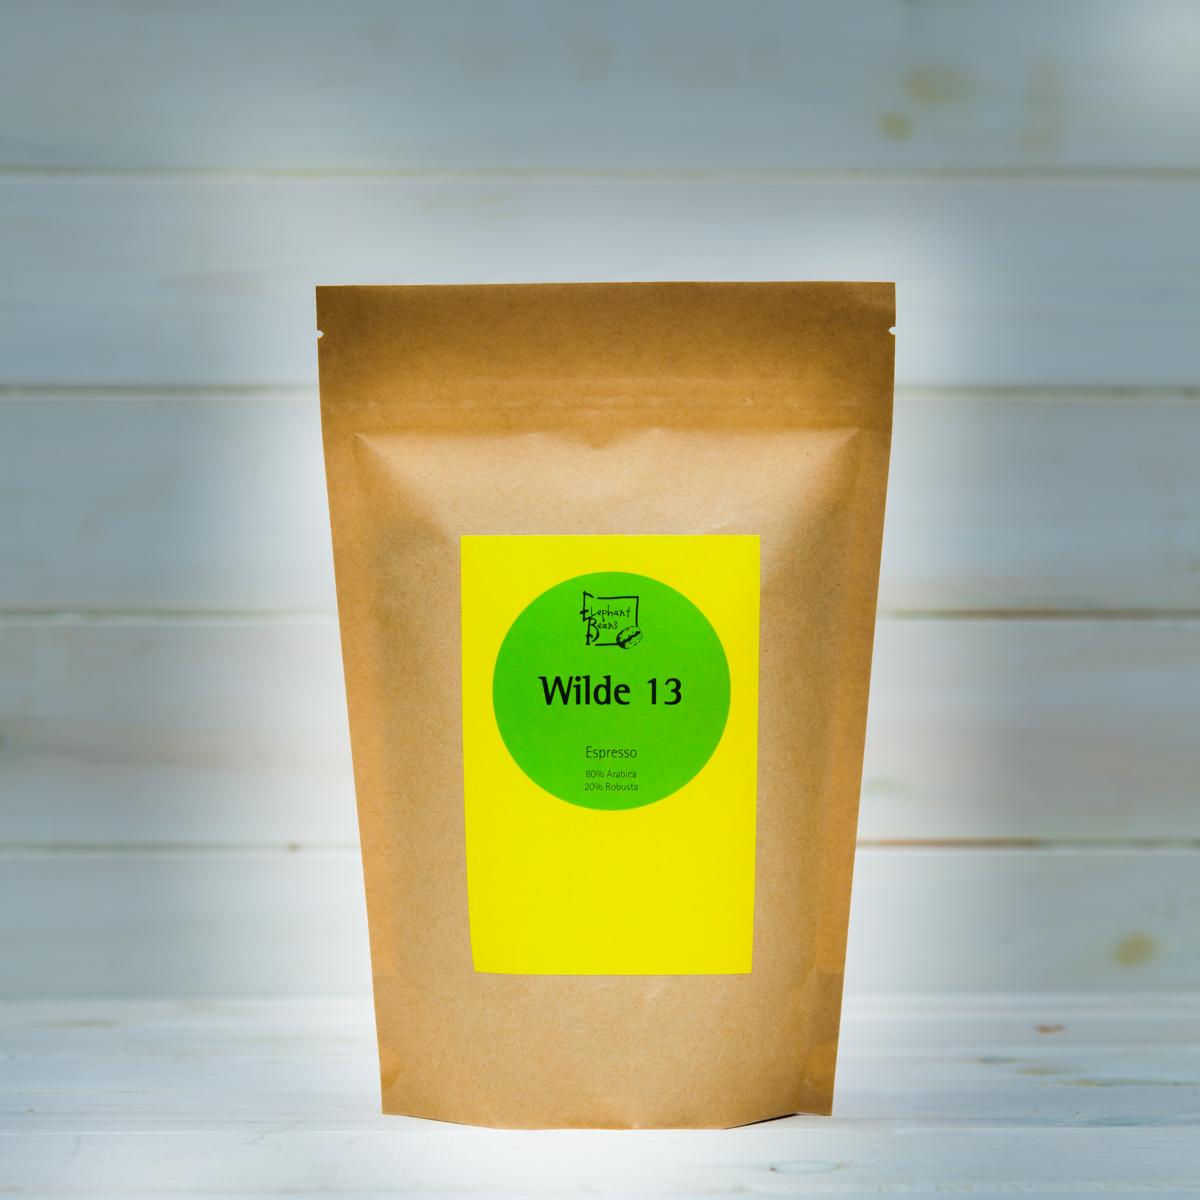 wilde-13-espresso-direkt-fair-gehandelt